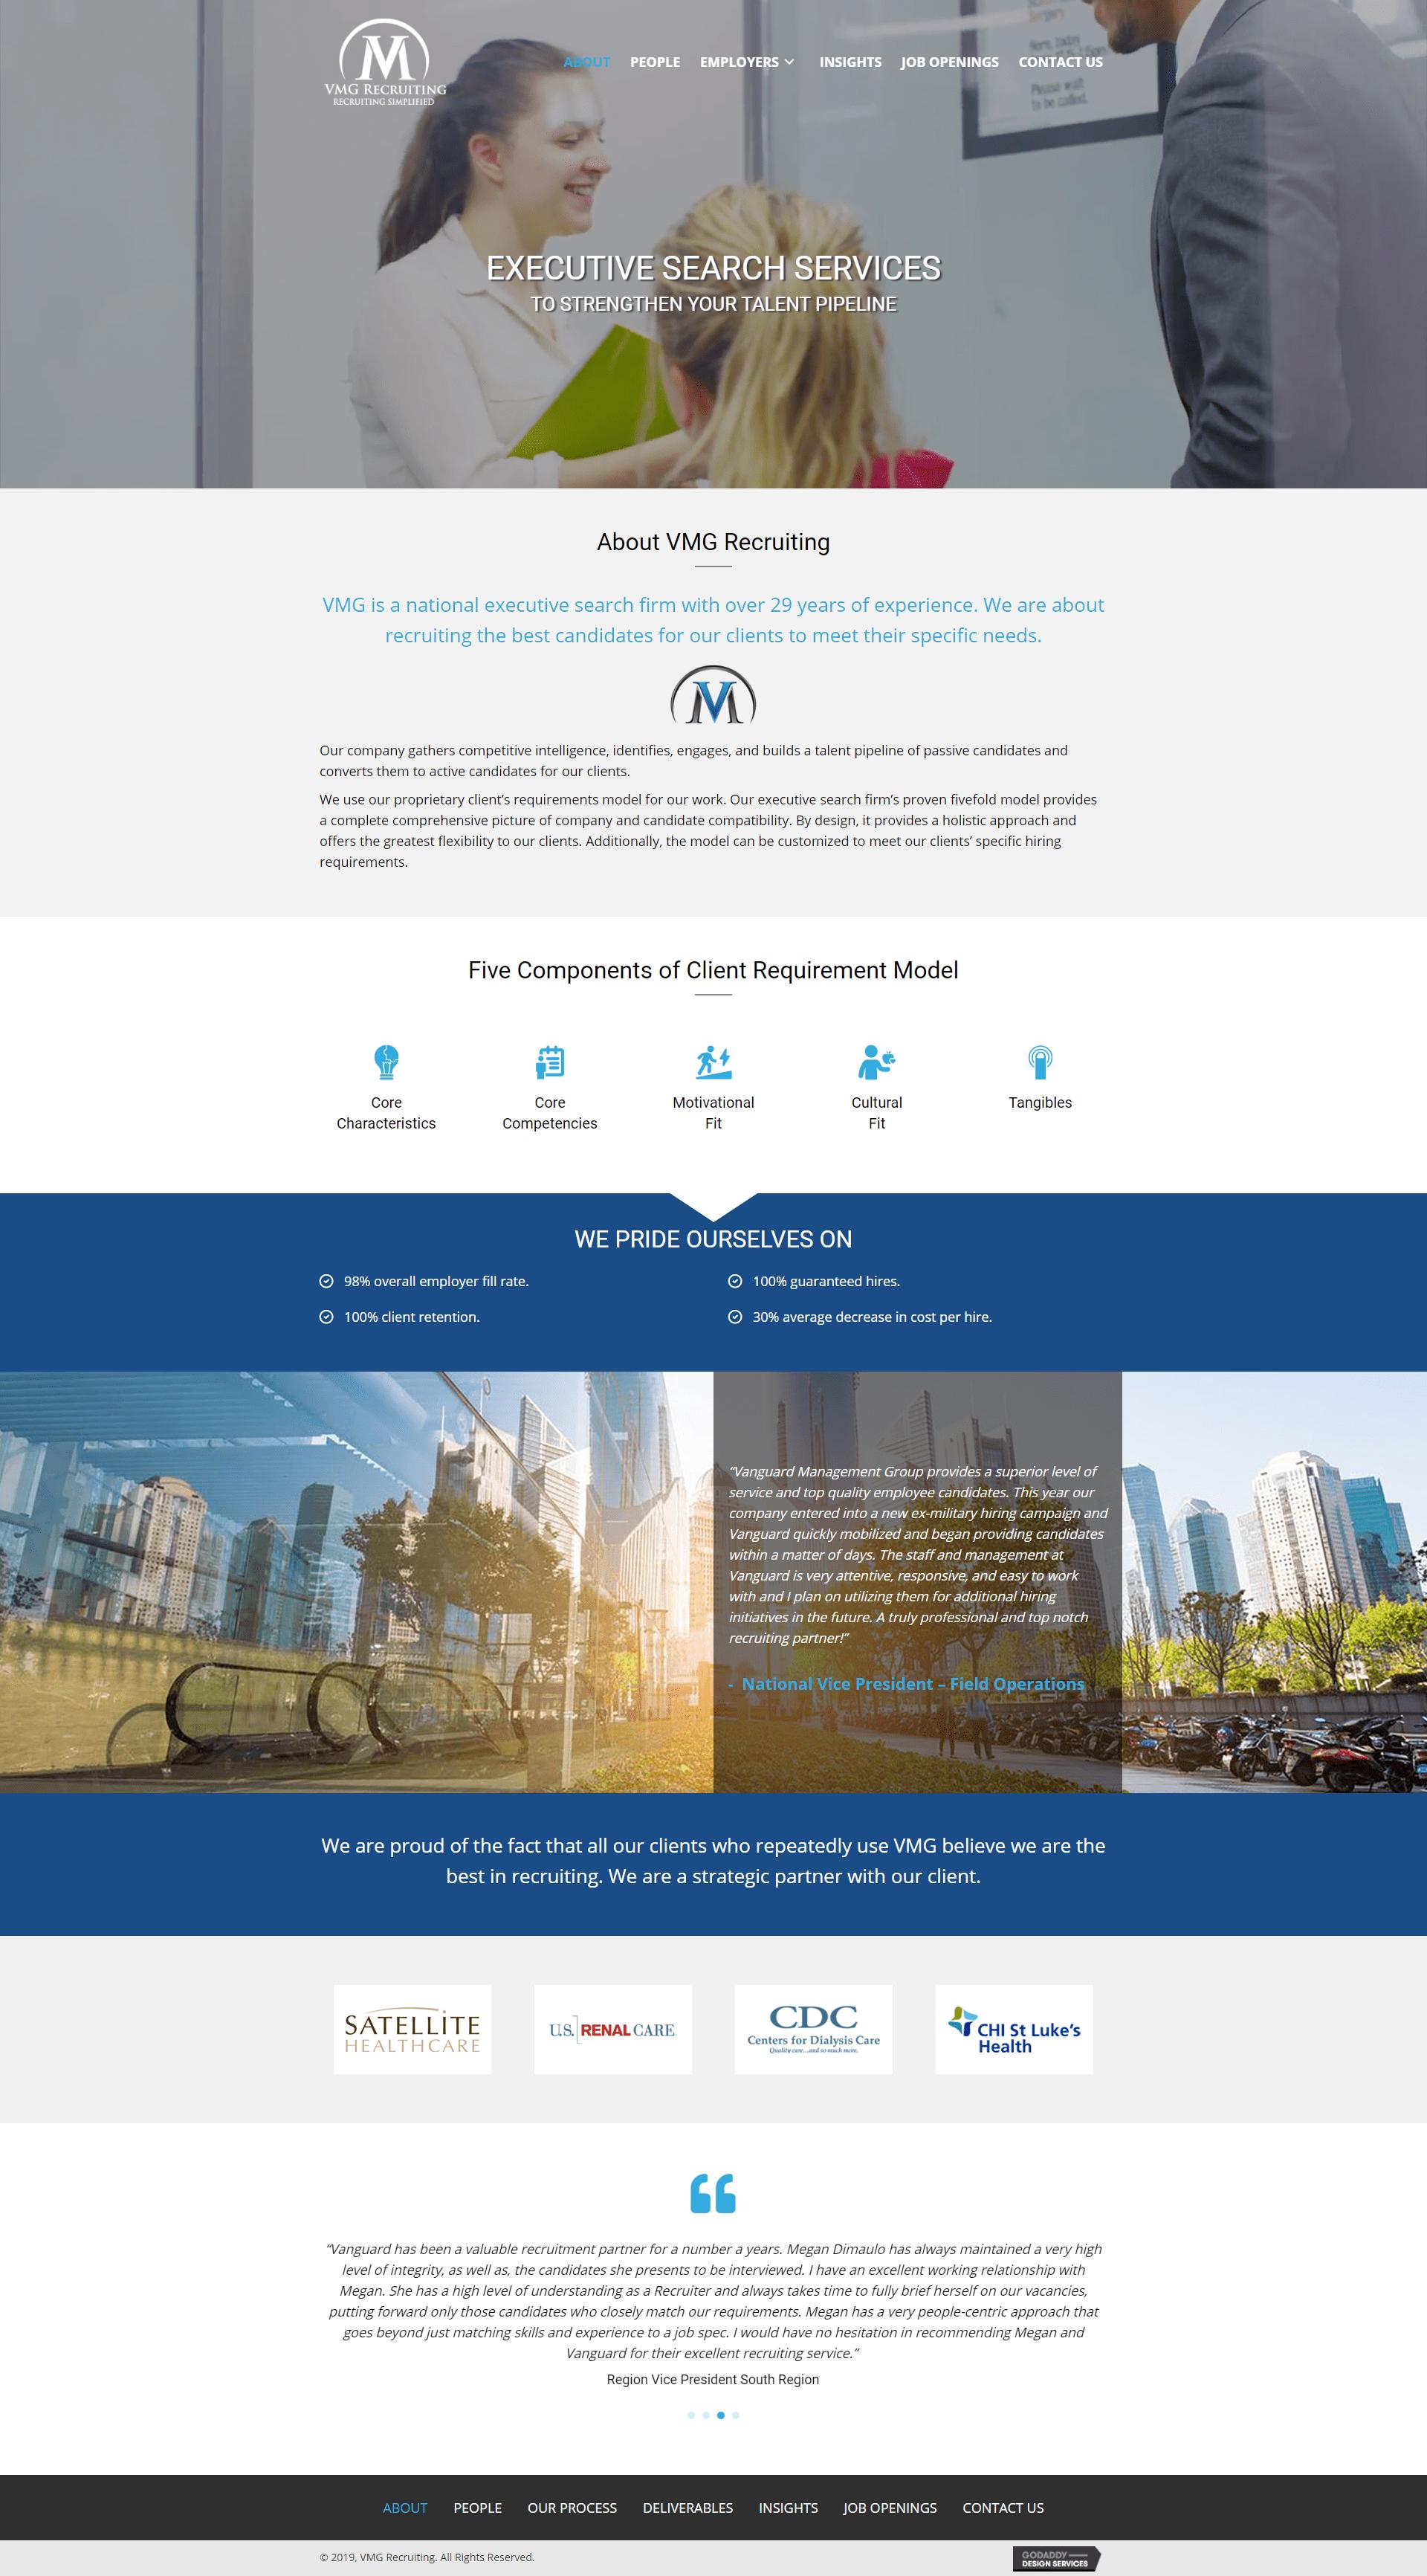 screencapture-VMG Recruiting-desktop